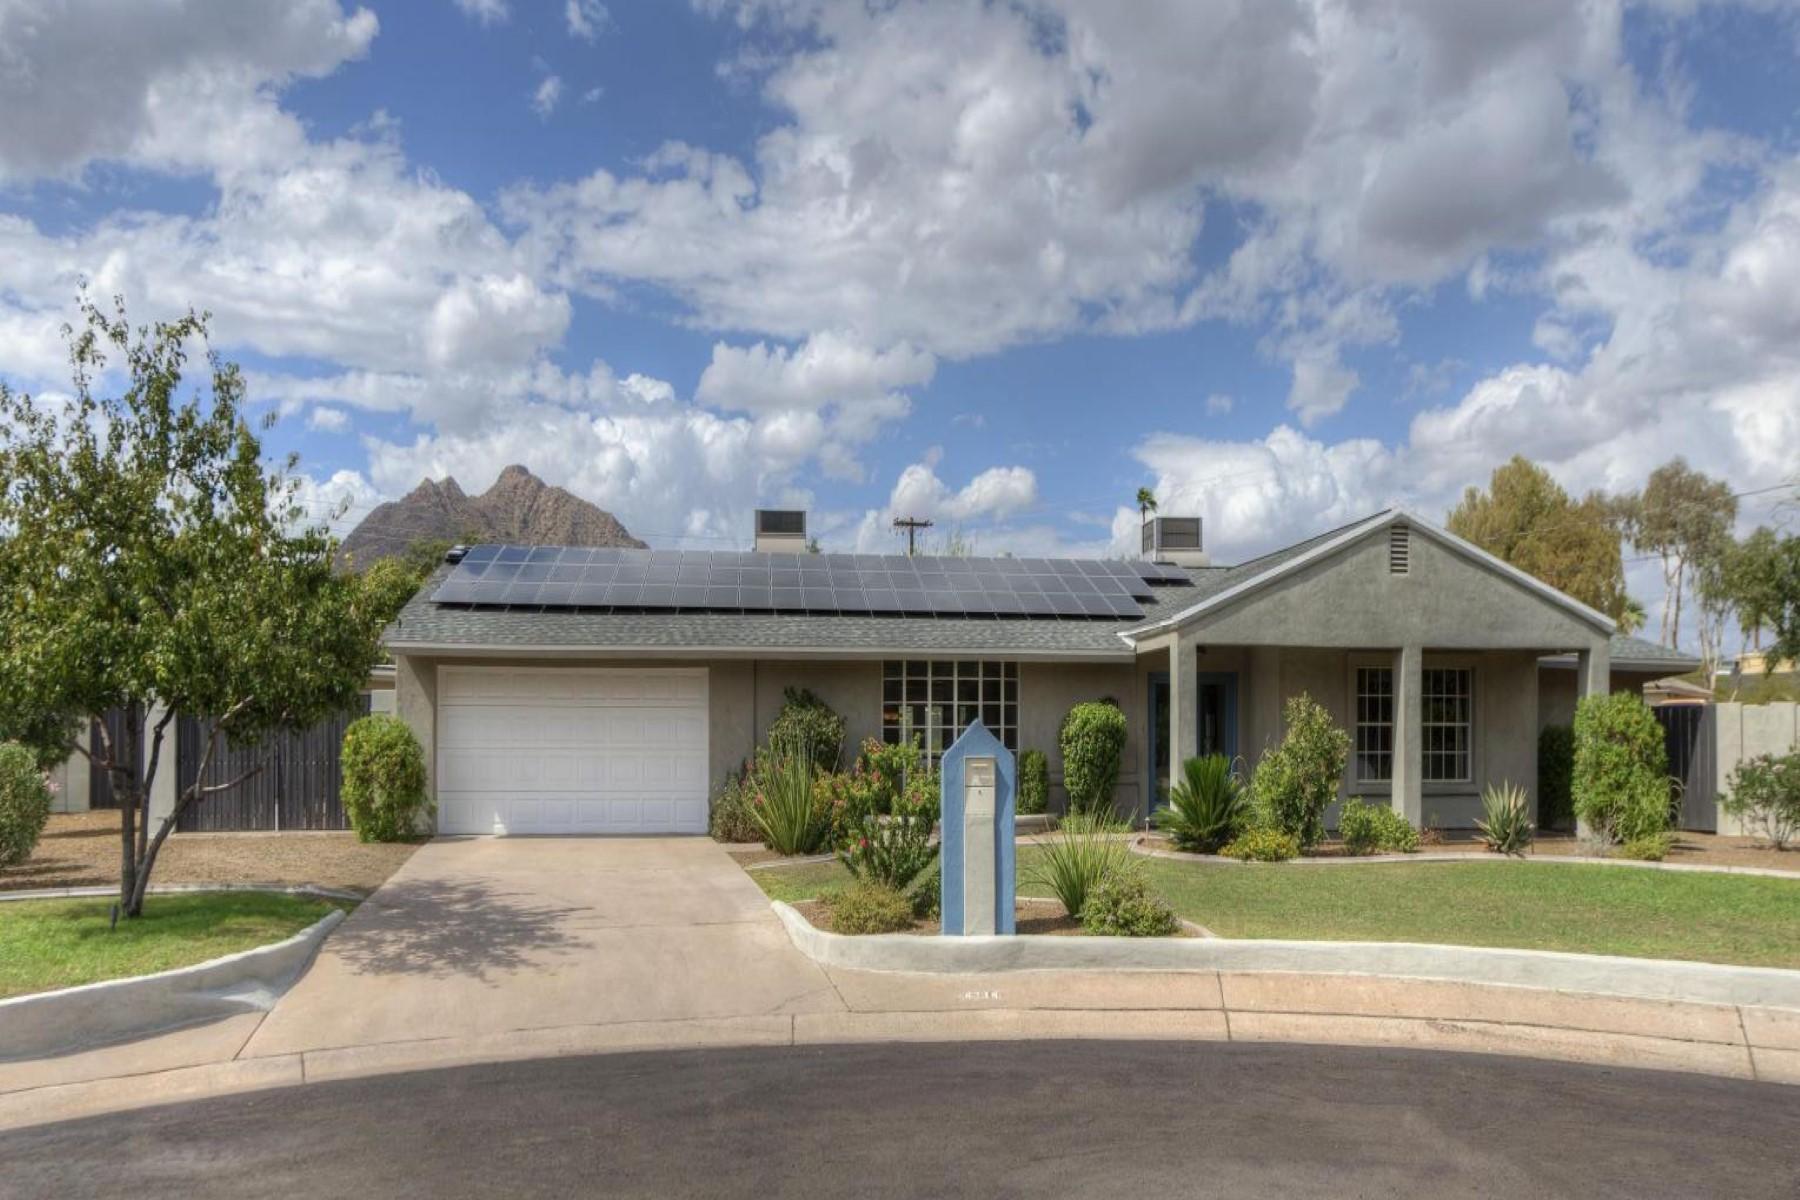 Casa Unifamiliar por un Venta en Premium 1/3 acre cul-de-sac lot with protected Camelback mountain views 4714 N 68th Place Scottsdale, Arizona 85251 Estados Unidos